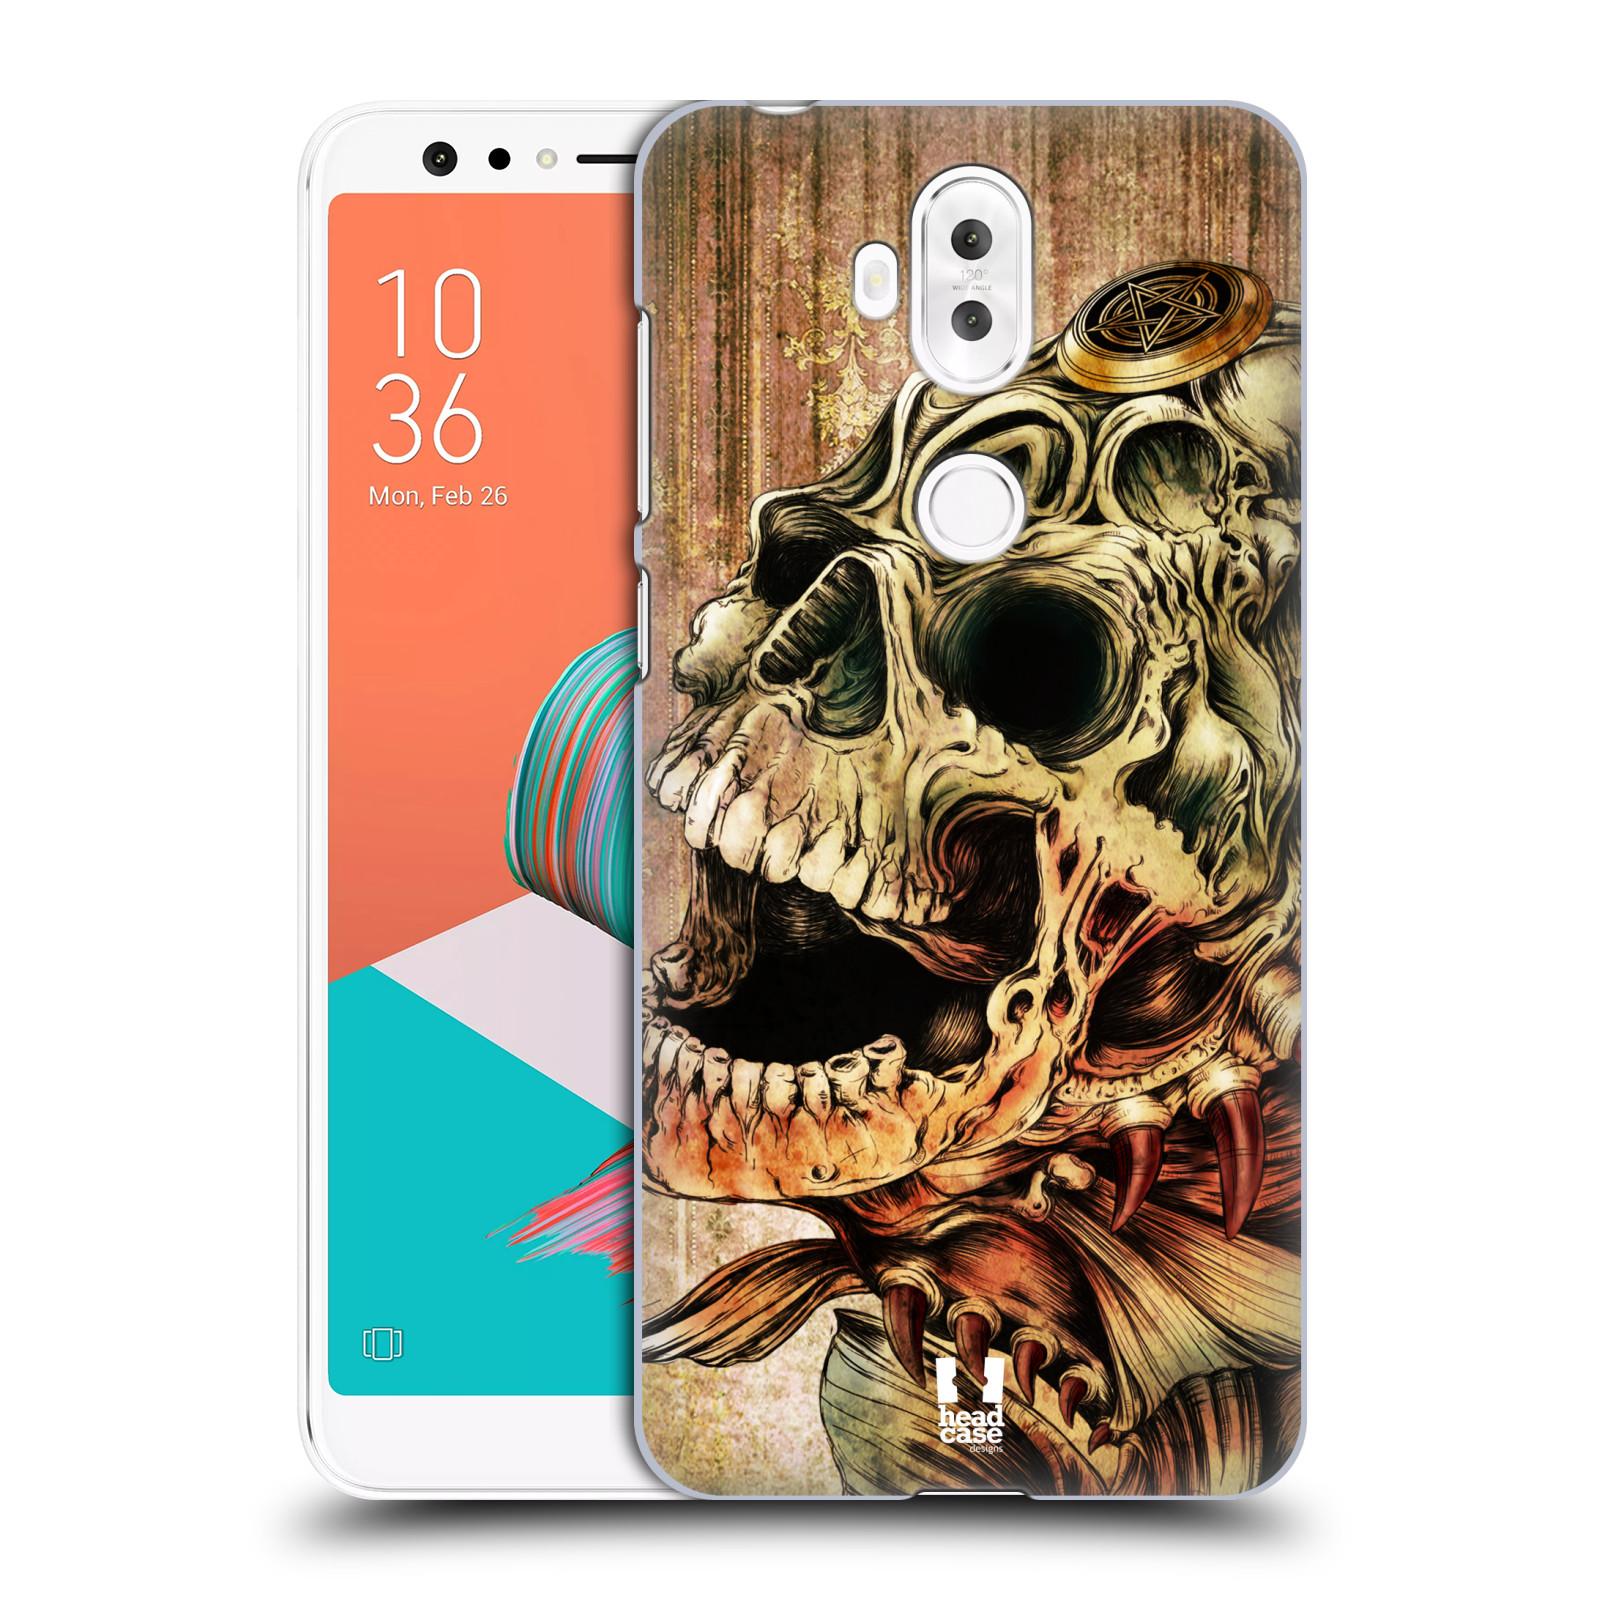 Plastové pouzdro na mobil Asus ZenFone 5 Lite ZC600KL - Head Case - PIRANHA (Plastový kryt či obal na mobilní telefon Asus ZenFone 5 Lite (ZC600KL) s motivem PIRANHA)